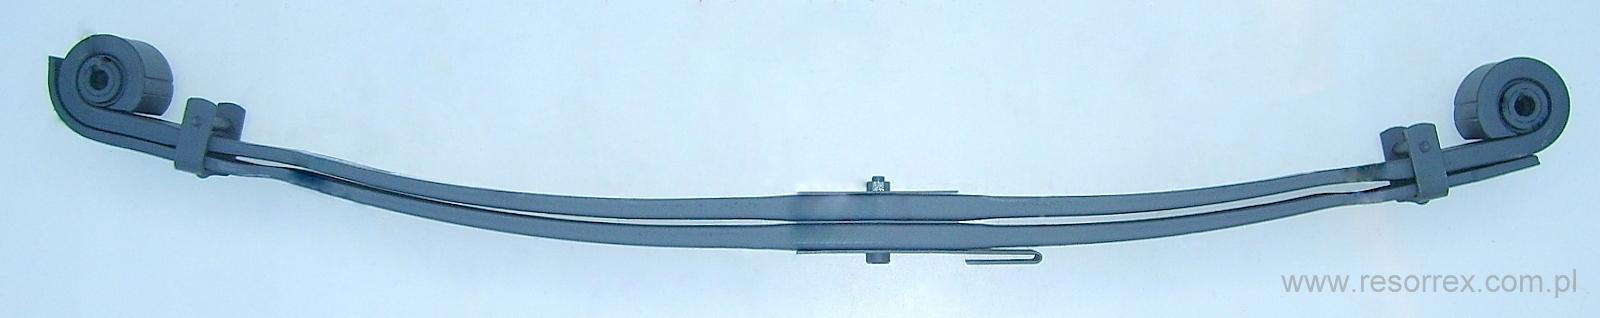 листовая передний 2 рессора man tga